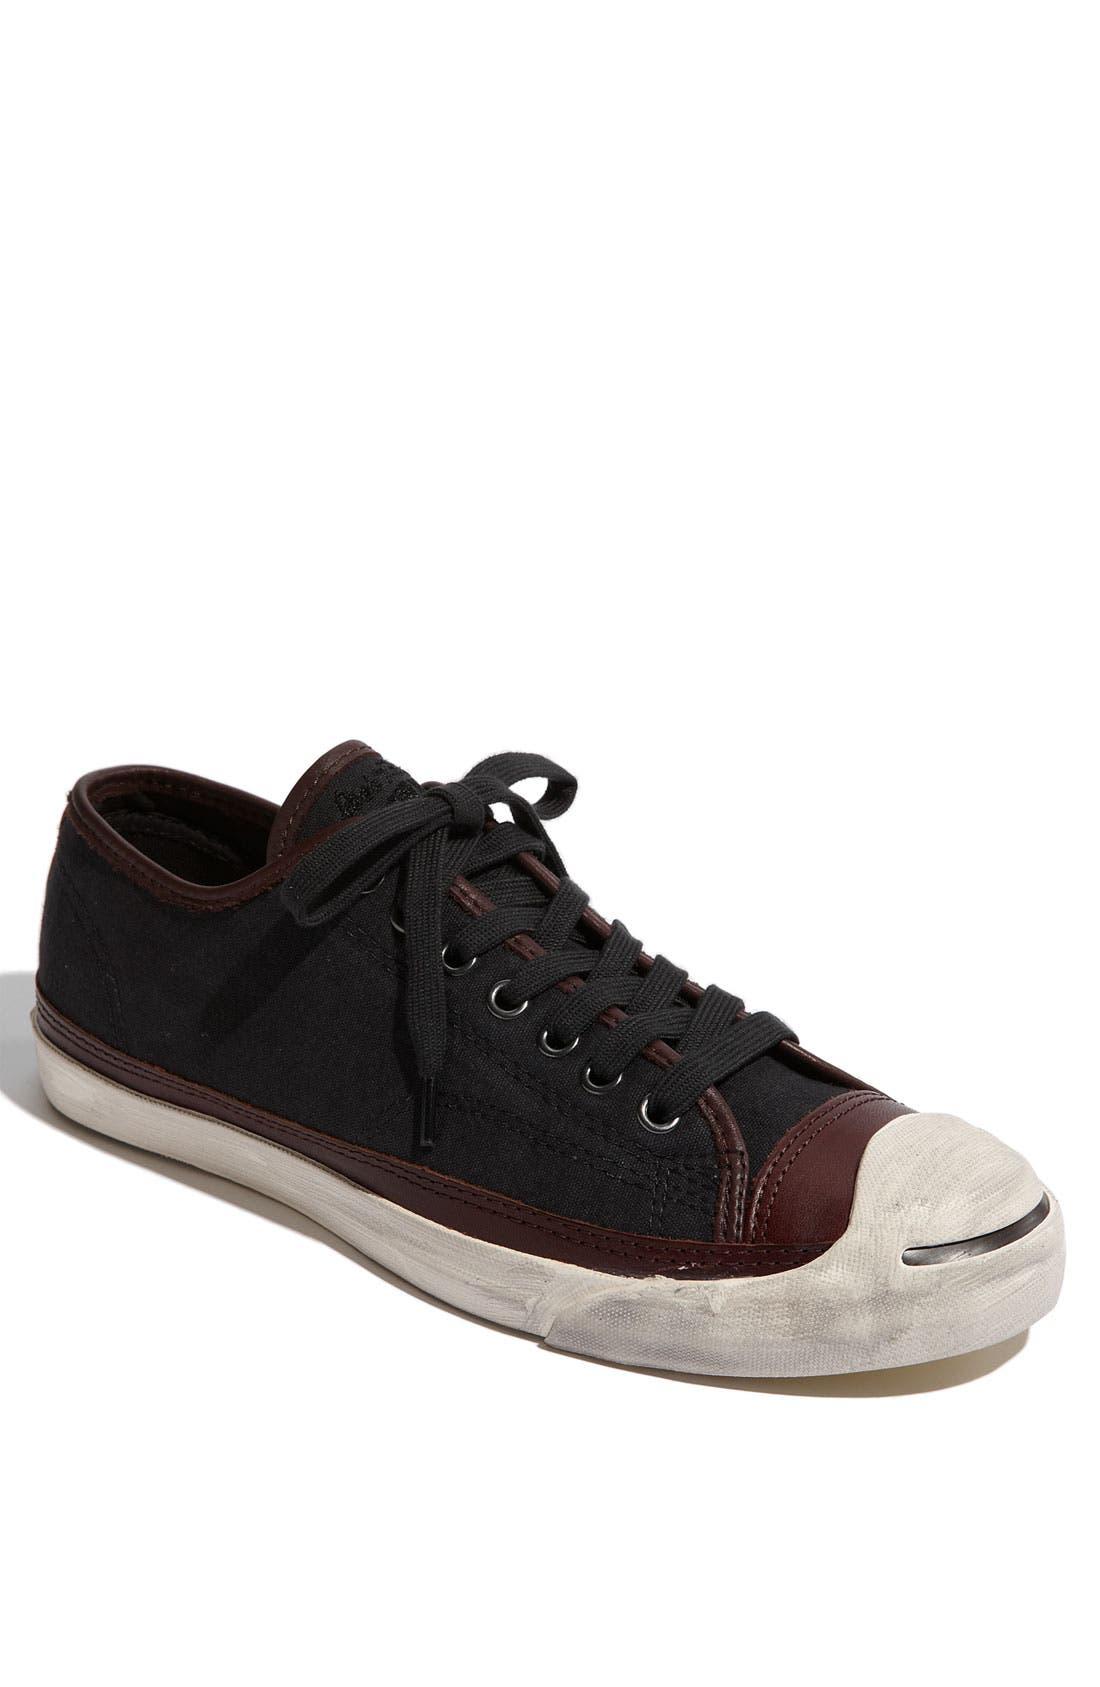 Alternate Image 1 Selected - Converse by John Varvatos 'Jack Purcell Vintage' Sneaker (Men)